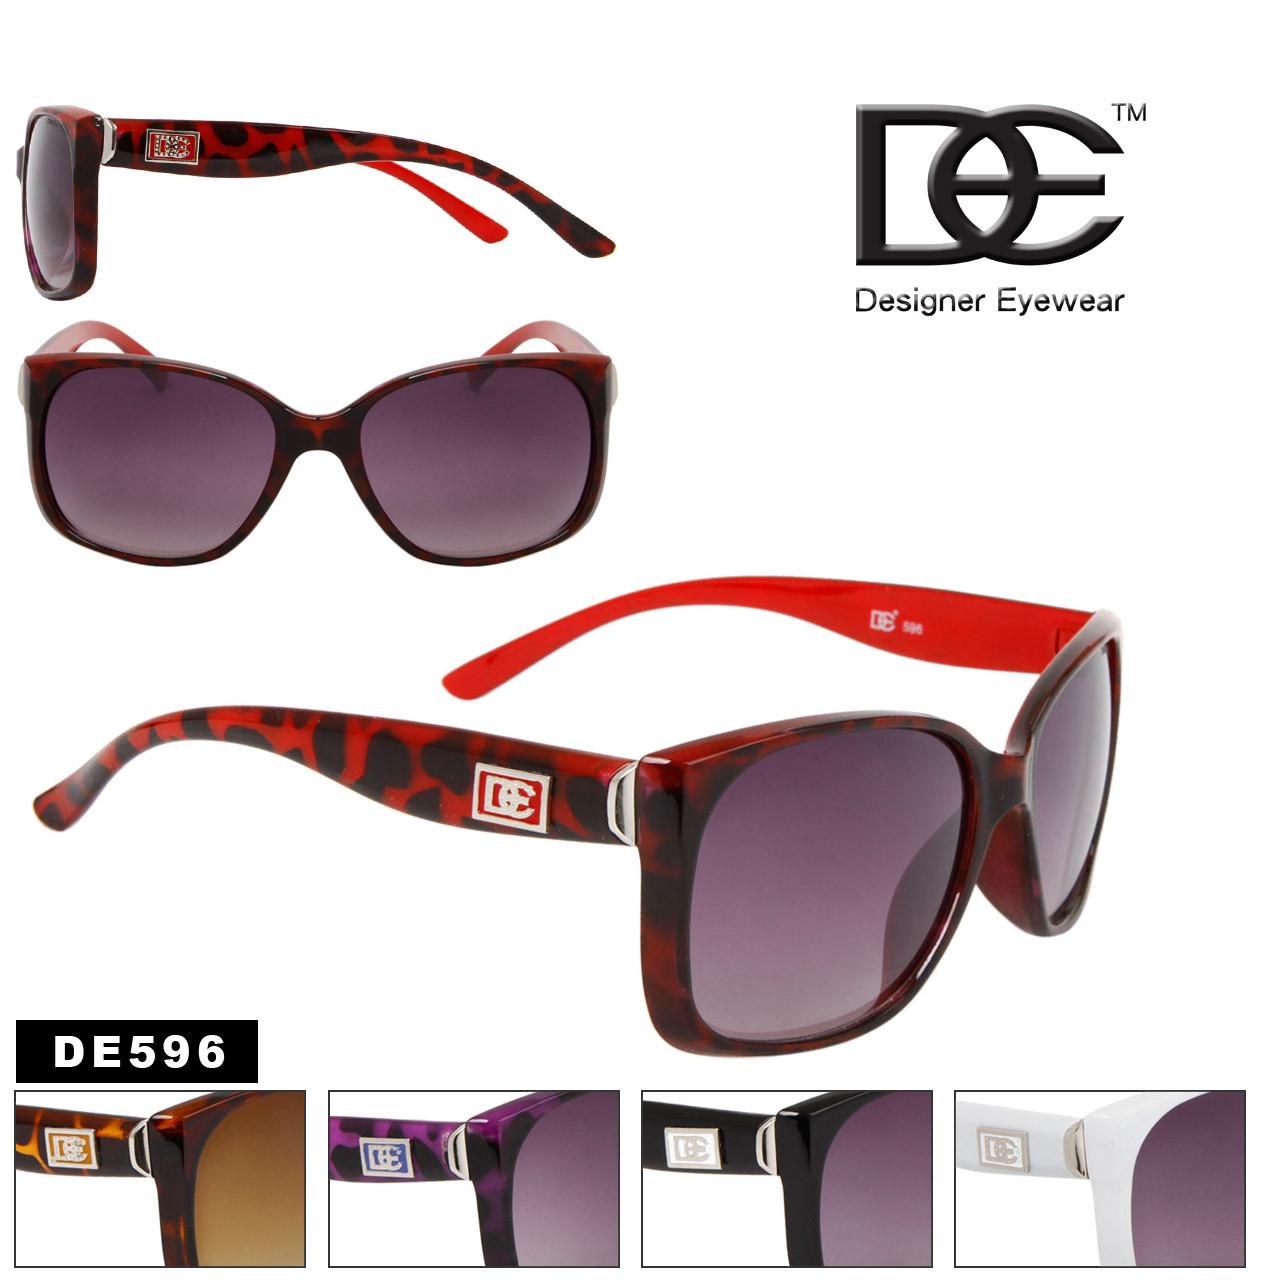 Fashion Sunglasses for Ladies DE596